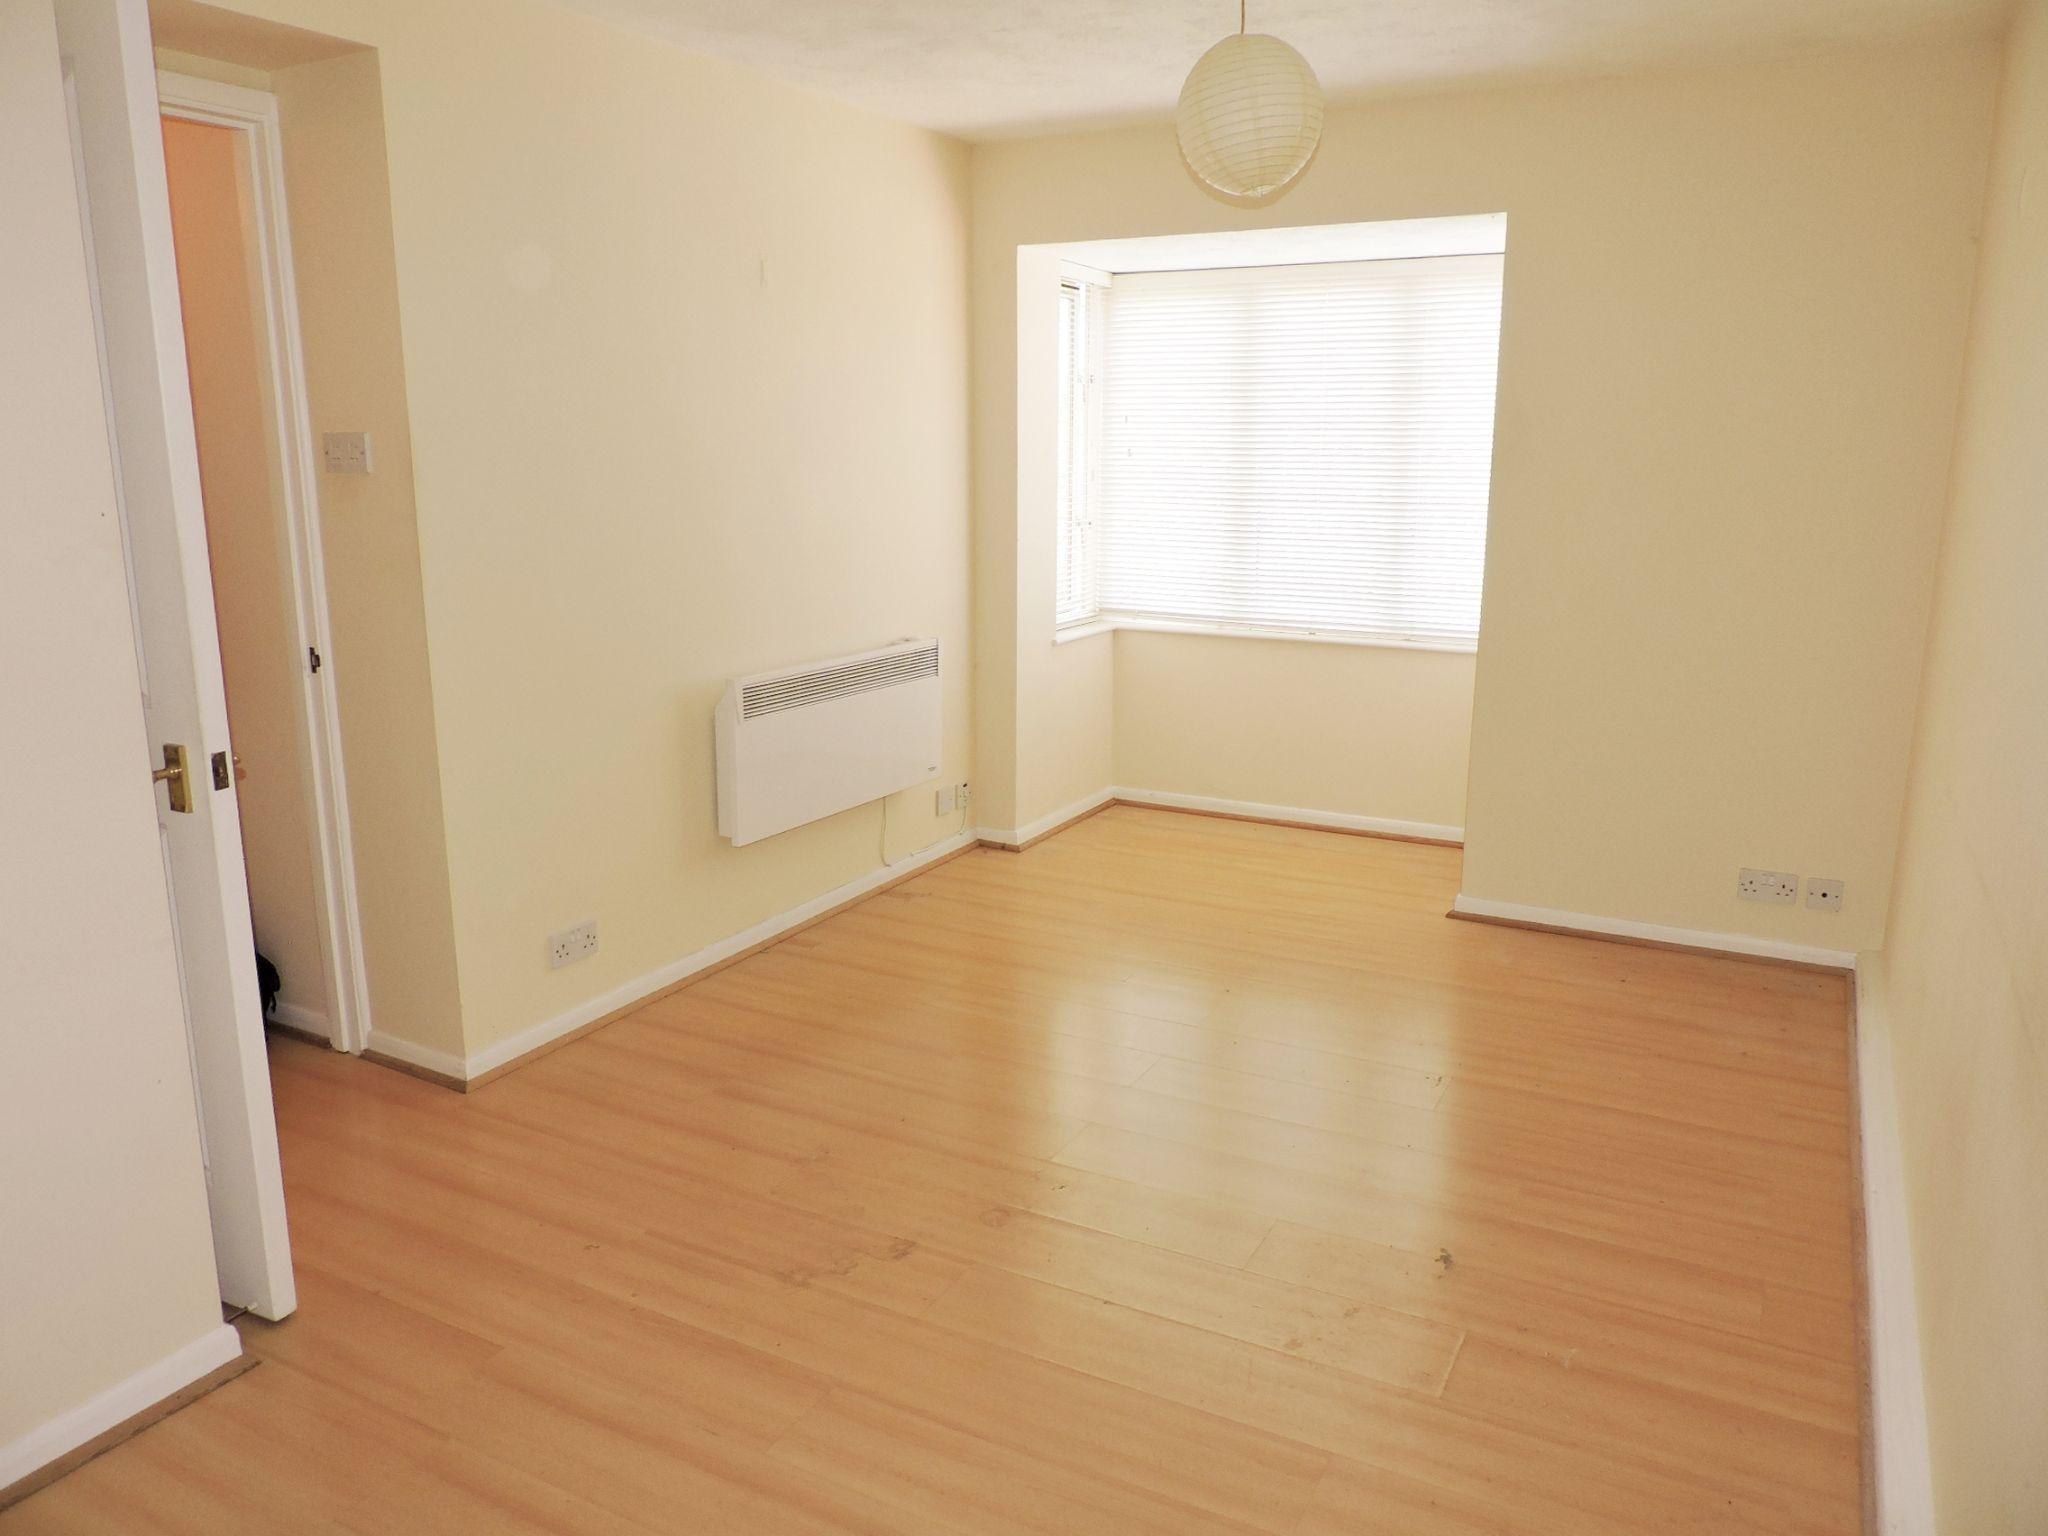 apartment flat/apartment Let in Worcester Park - Photograph 3